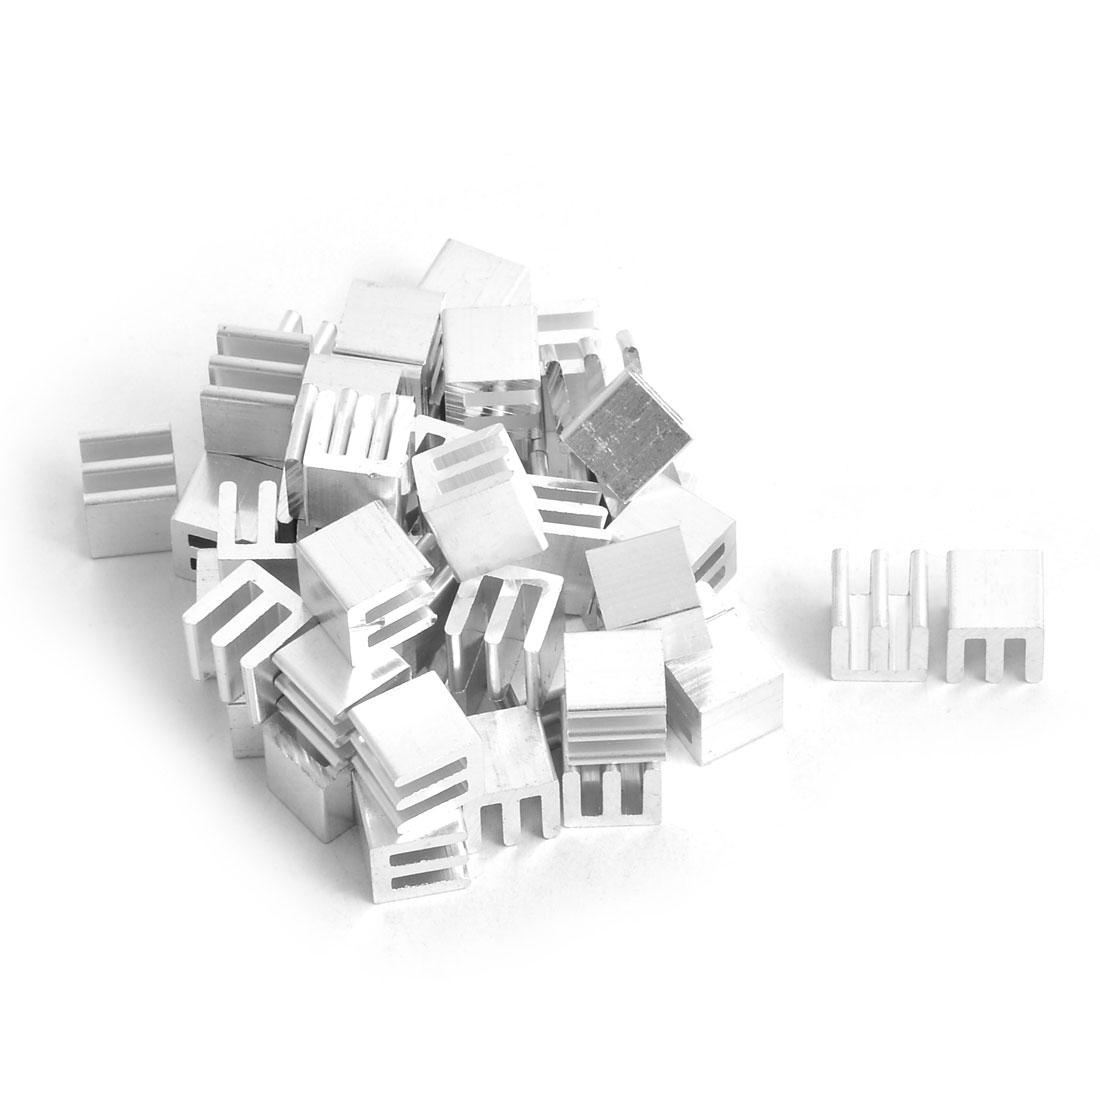 Aluminium Heat Diffusion Cooling Fin Silver Tone 10mm x 10mm x 10mm 50 Pcs